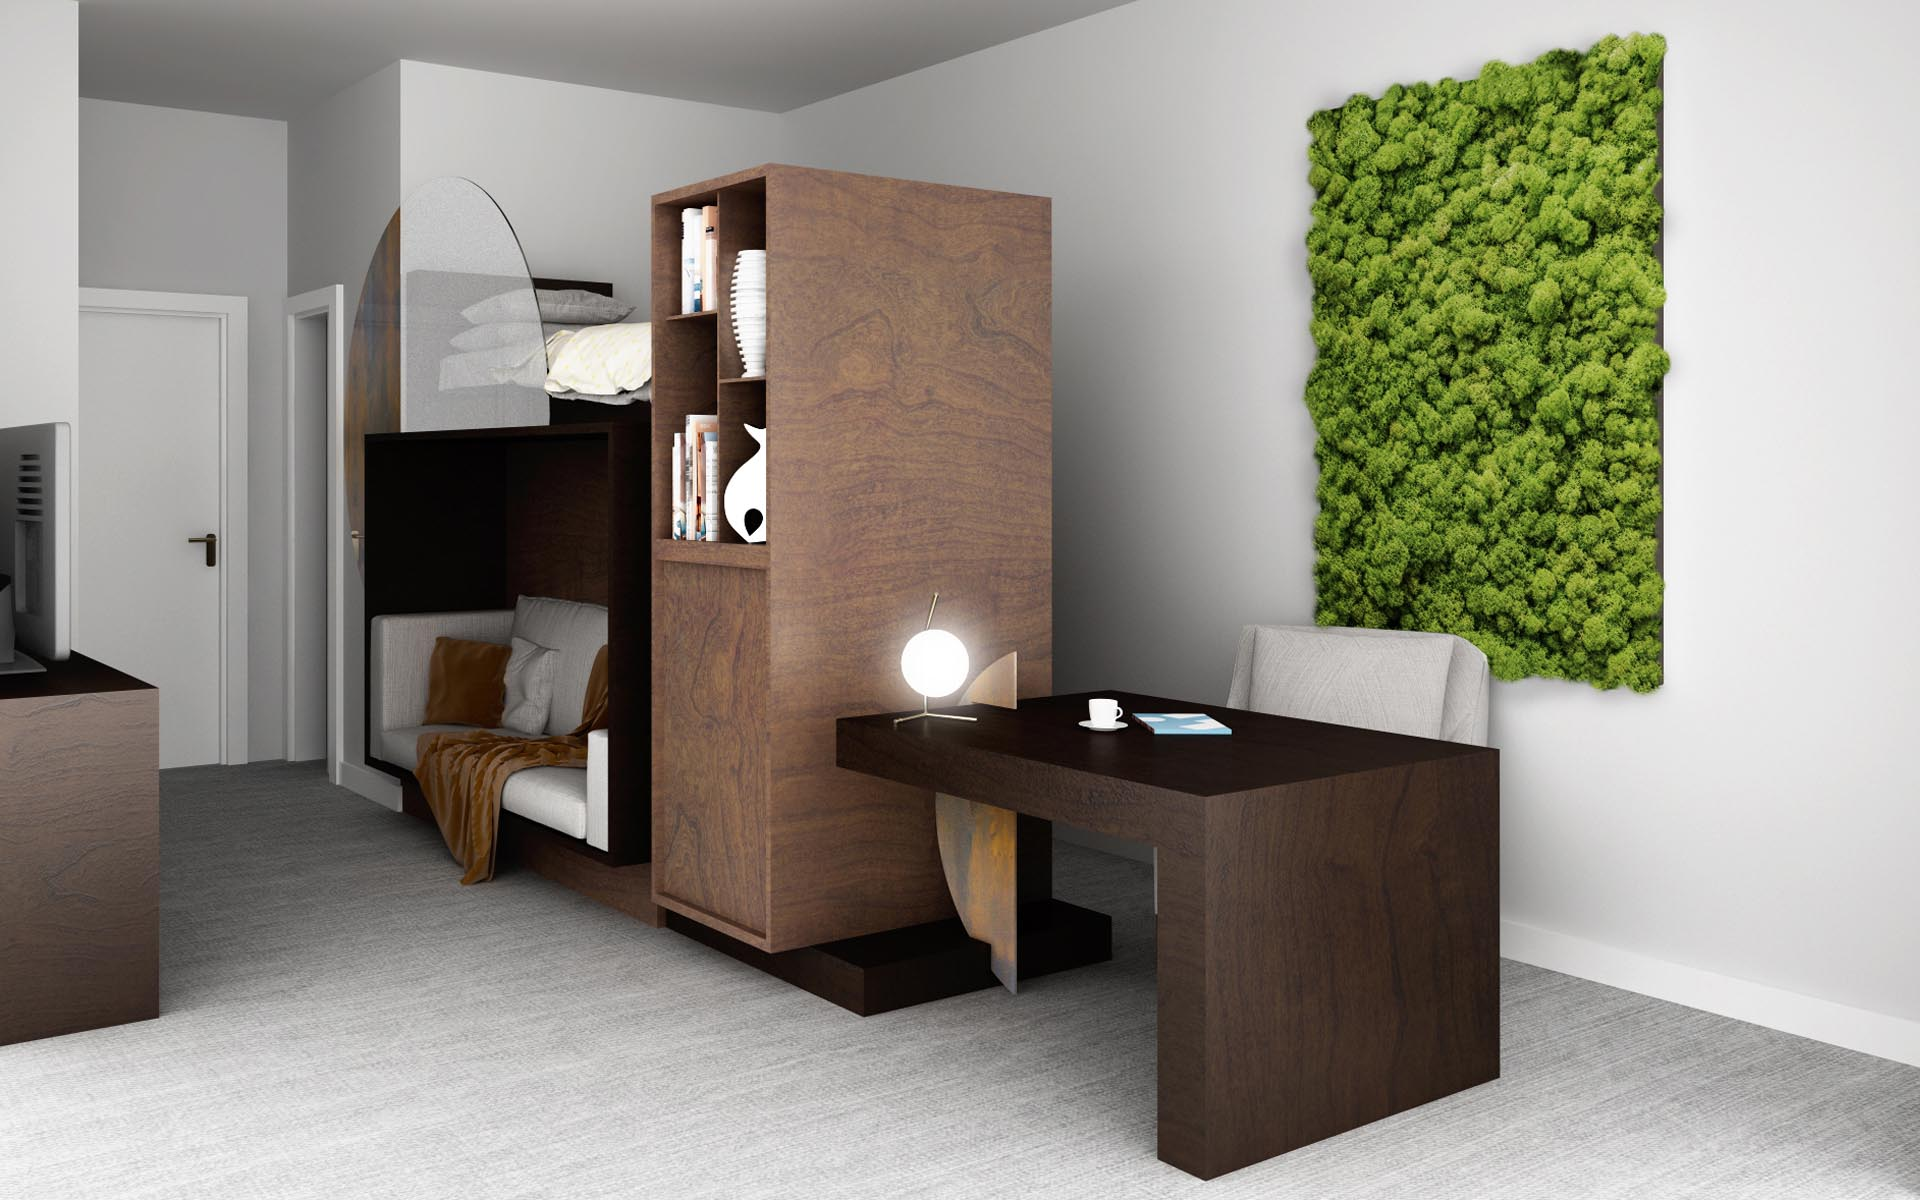 interior-design-hotel-concept-camera-albergo6